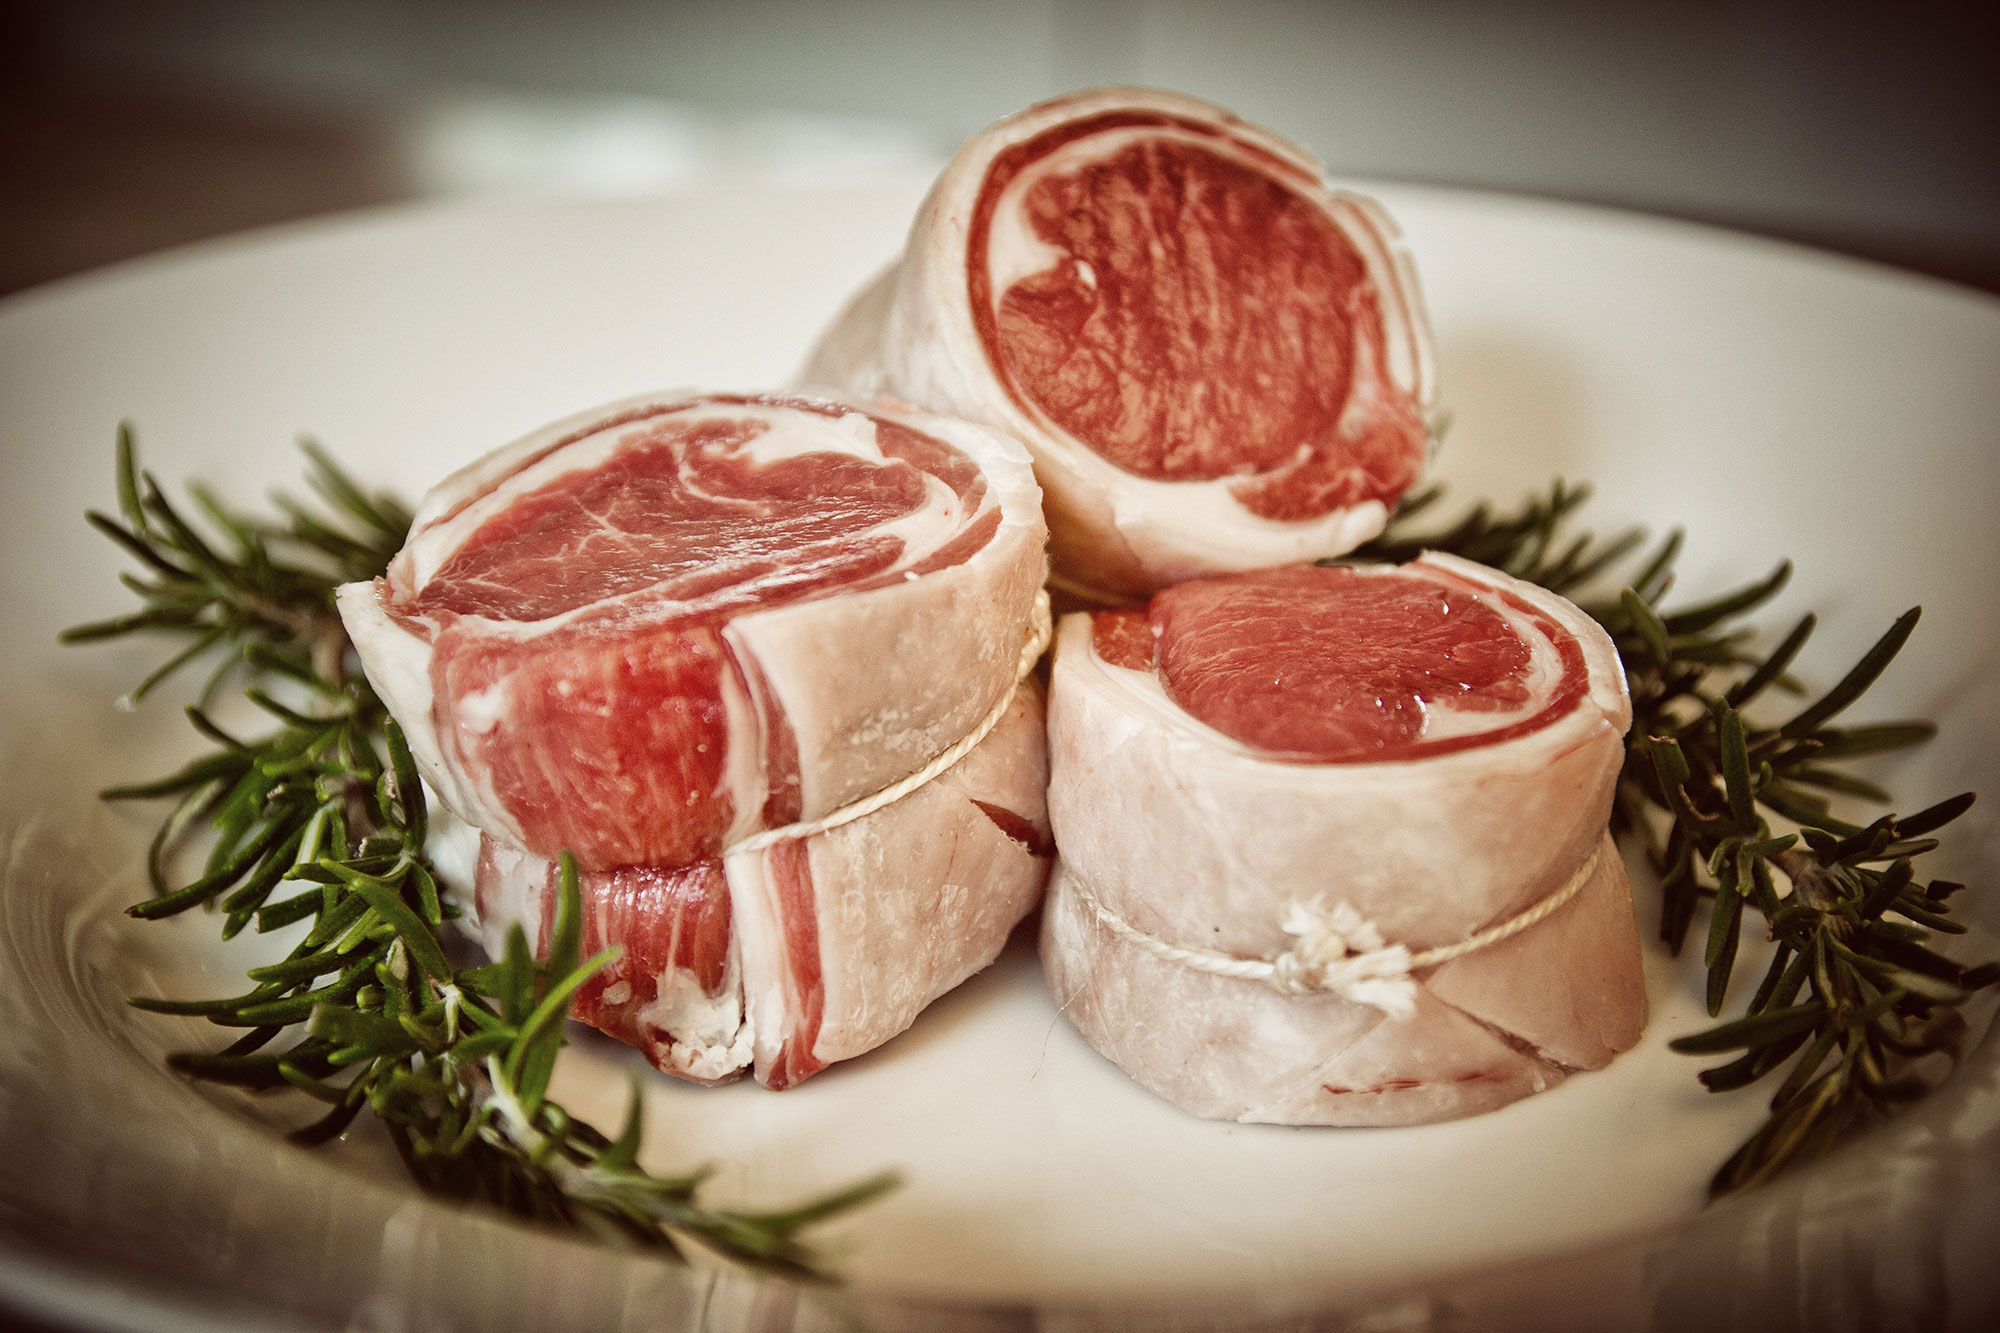 How To Cook Lamb Shoulder Noisettes